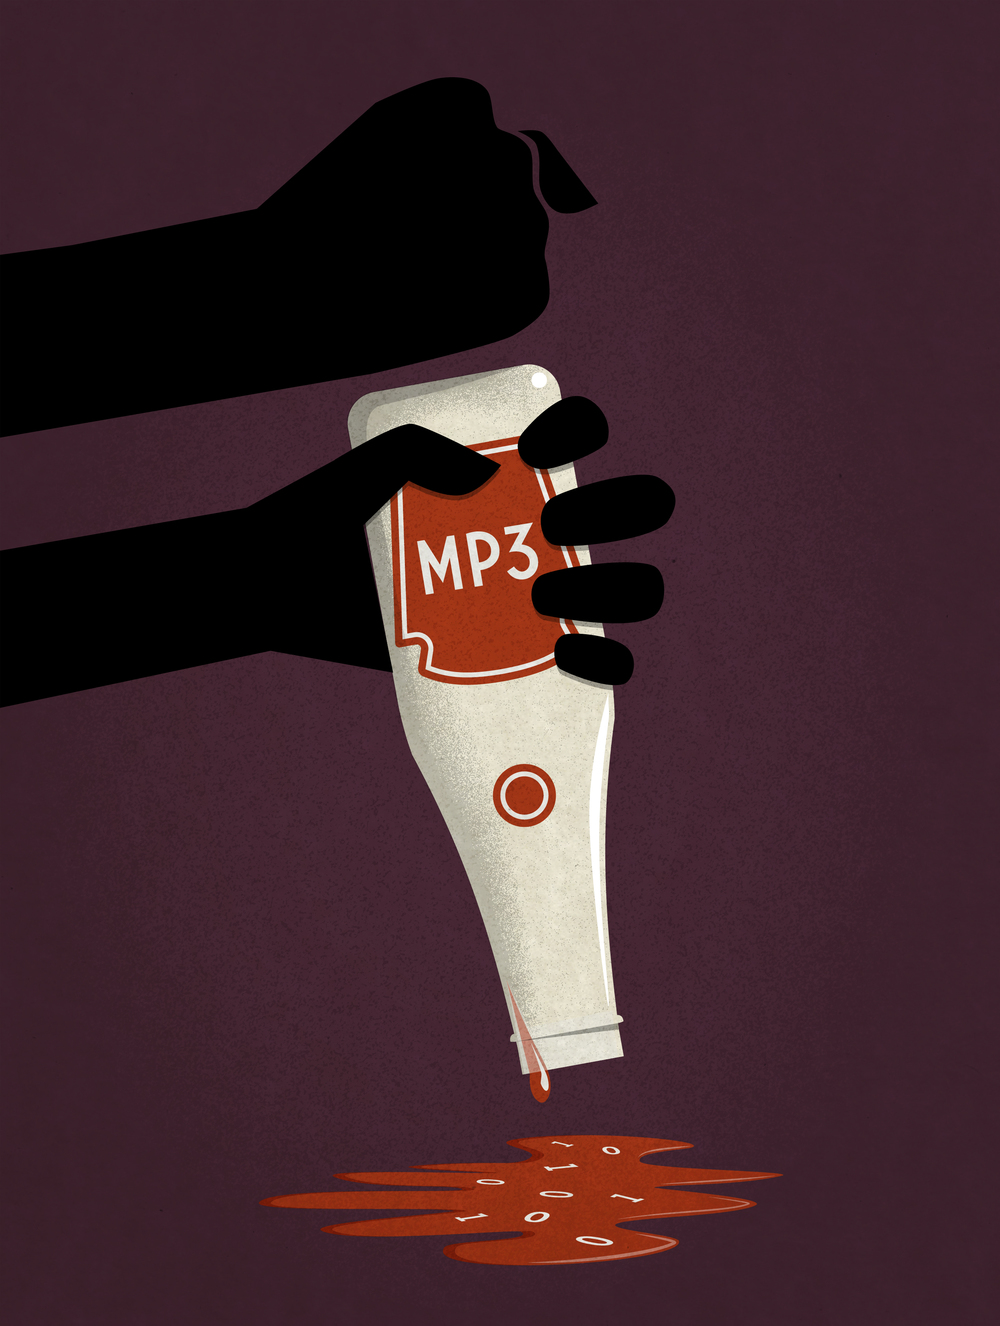 GONZAI mp3 Ketchup-01.jpg